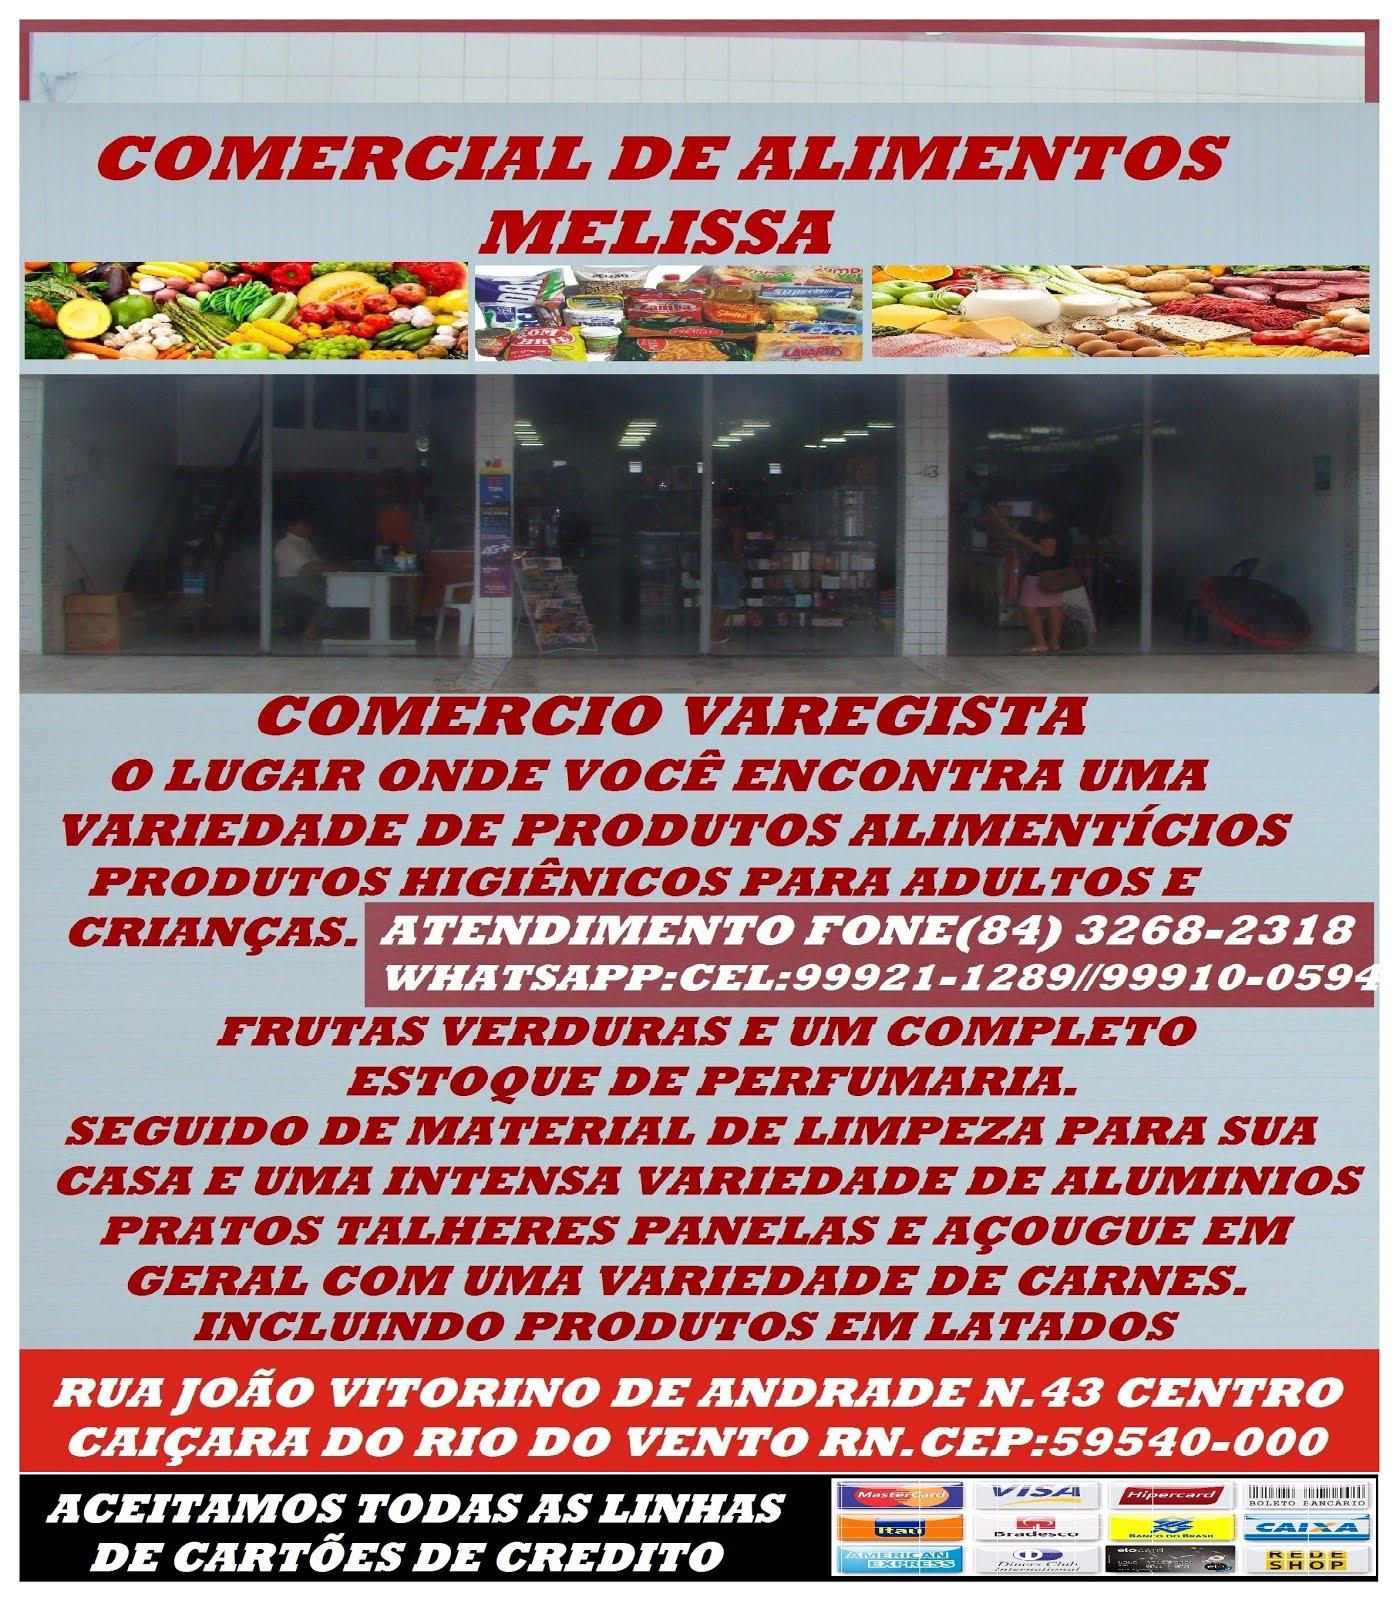 COMERCIAL DE ALIMENTOS MELISSA